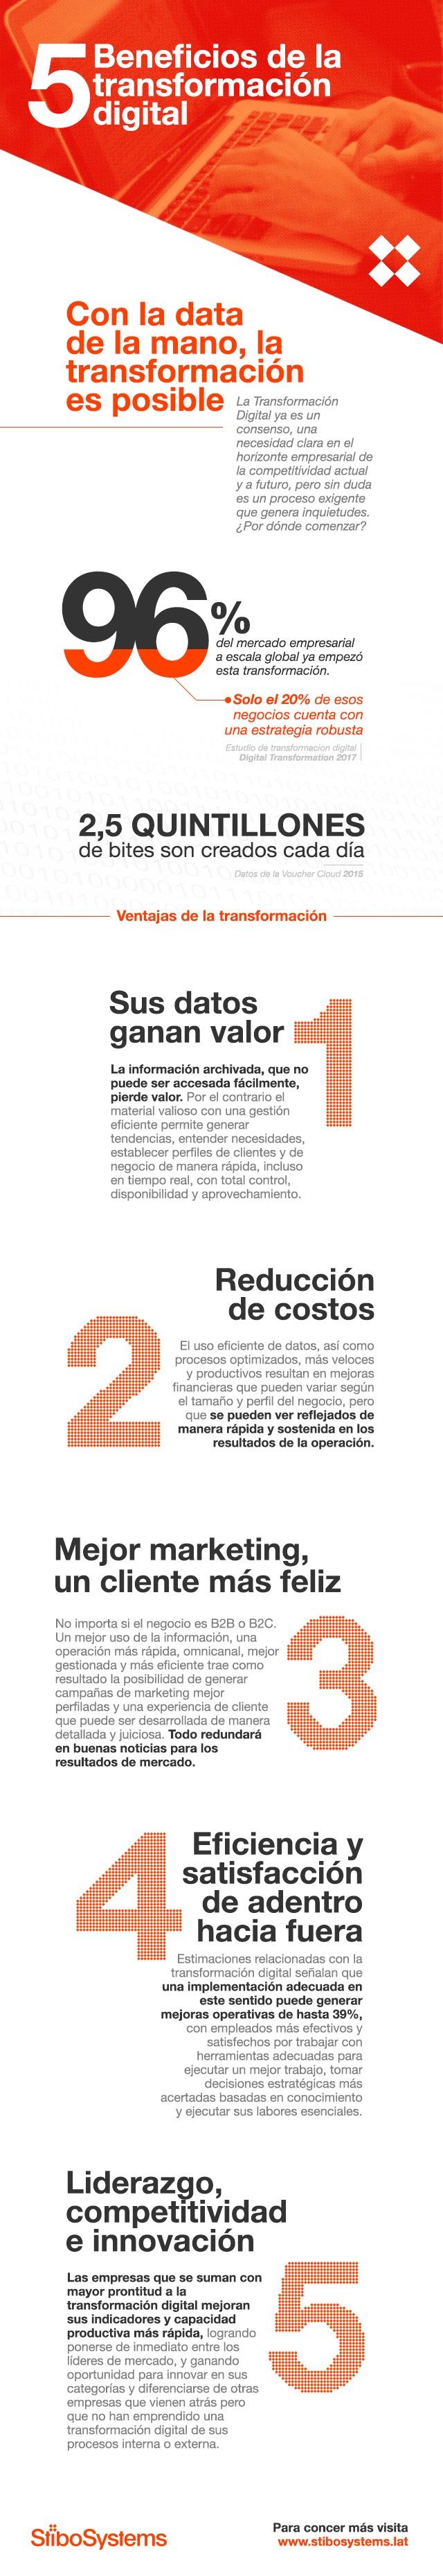 Stibo_Infografia5Beneficios.jpg